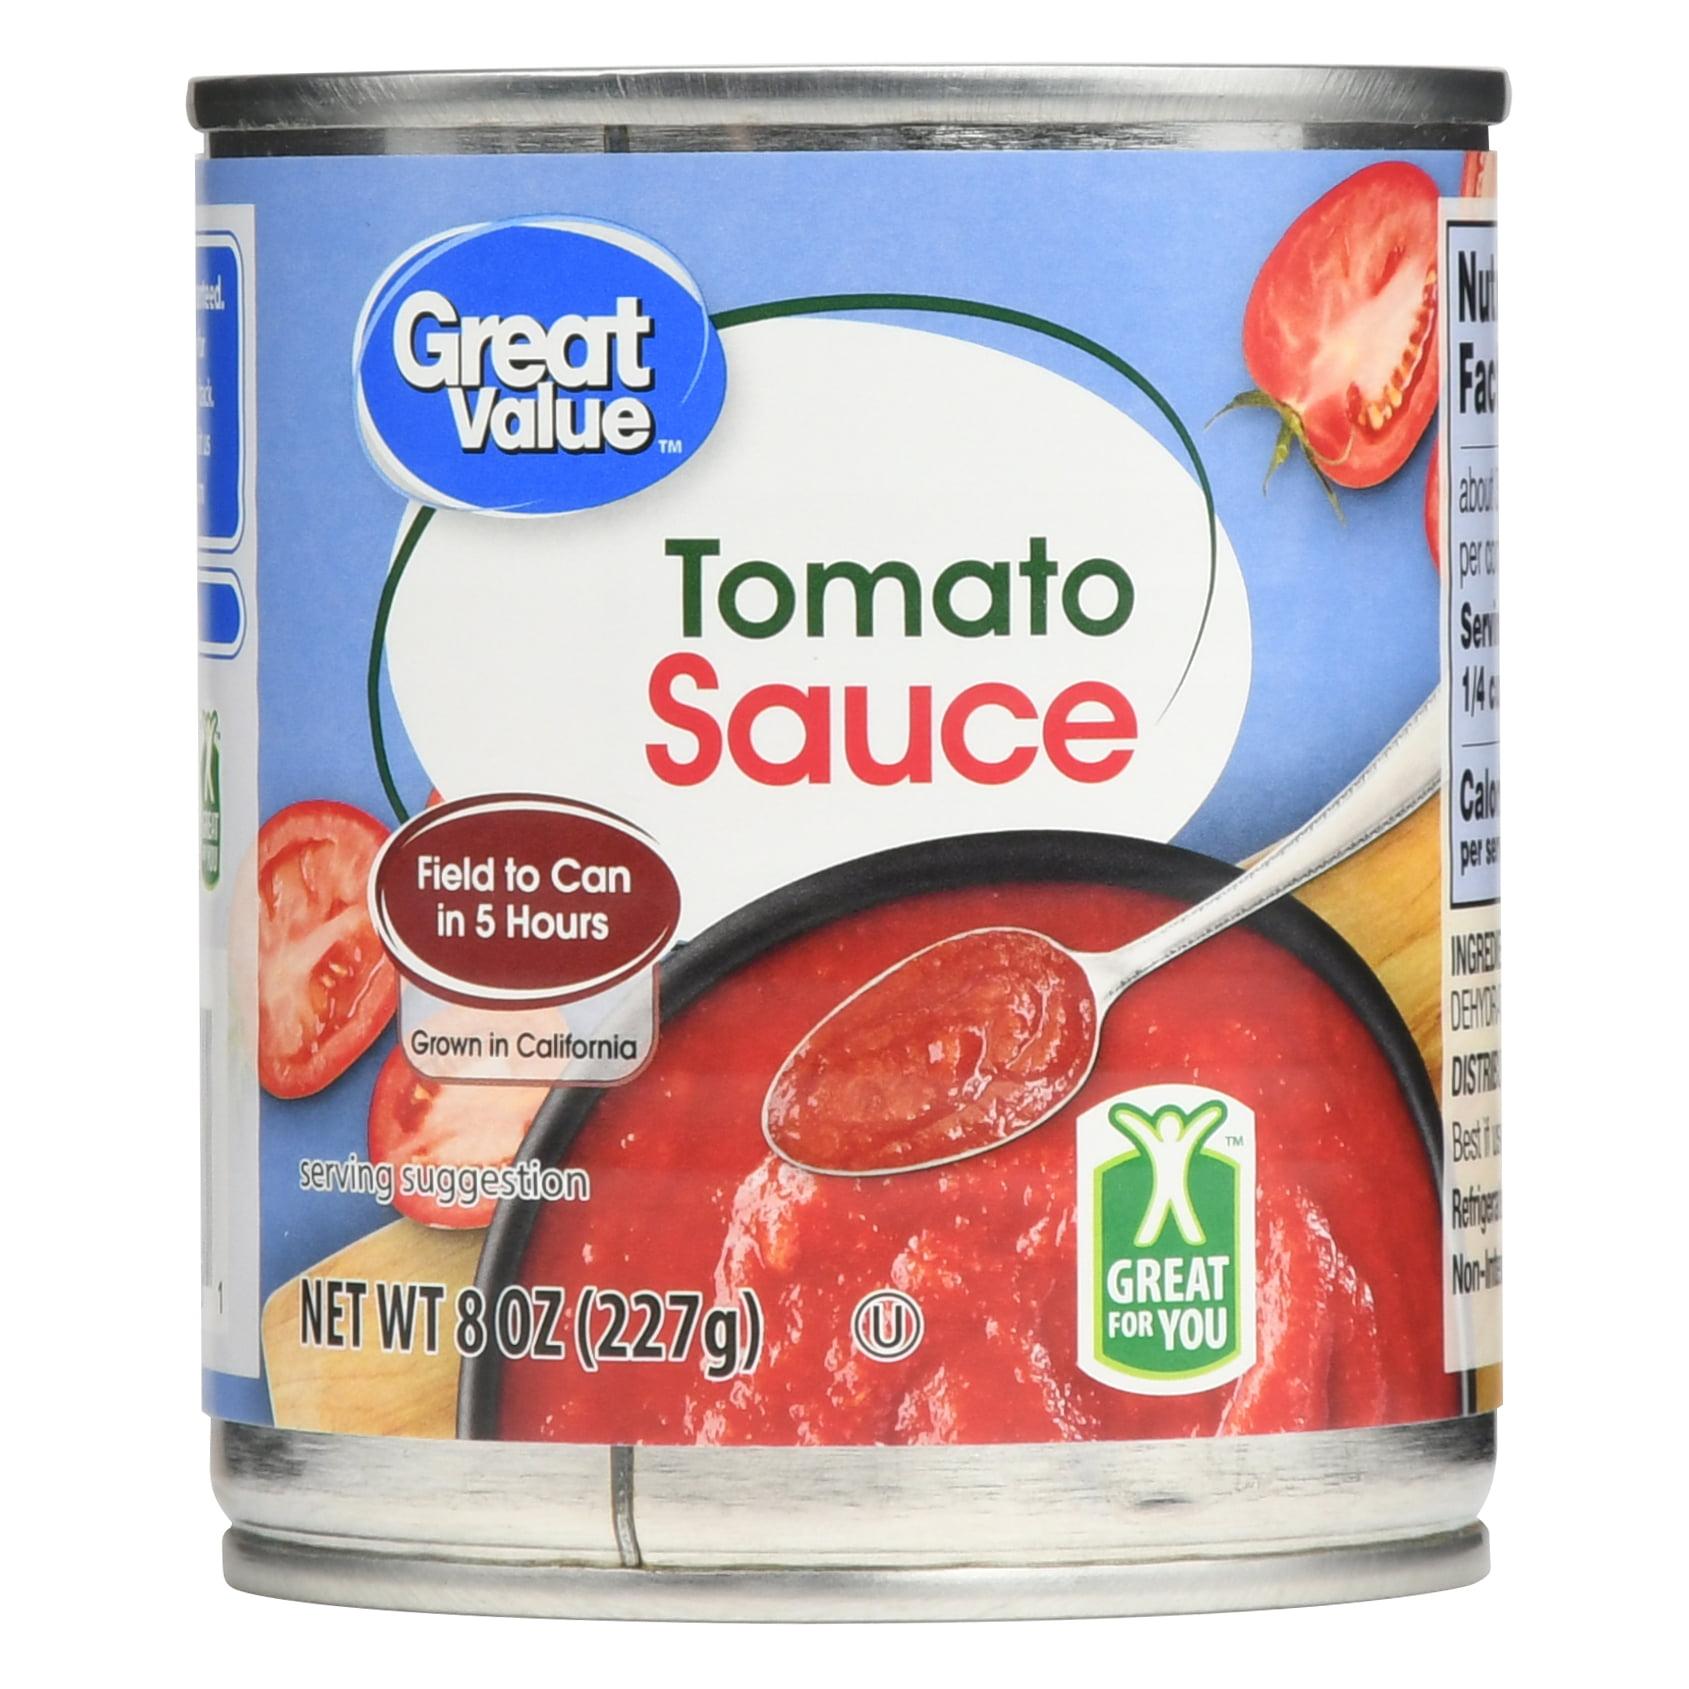 Great Value Tomato Sauce, 8 oz